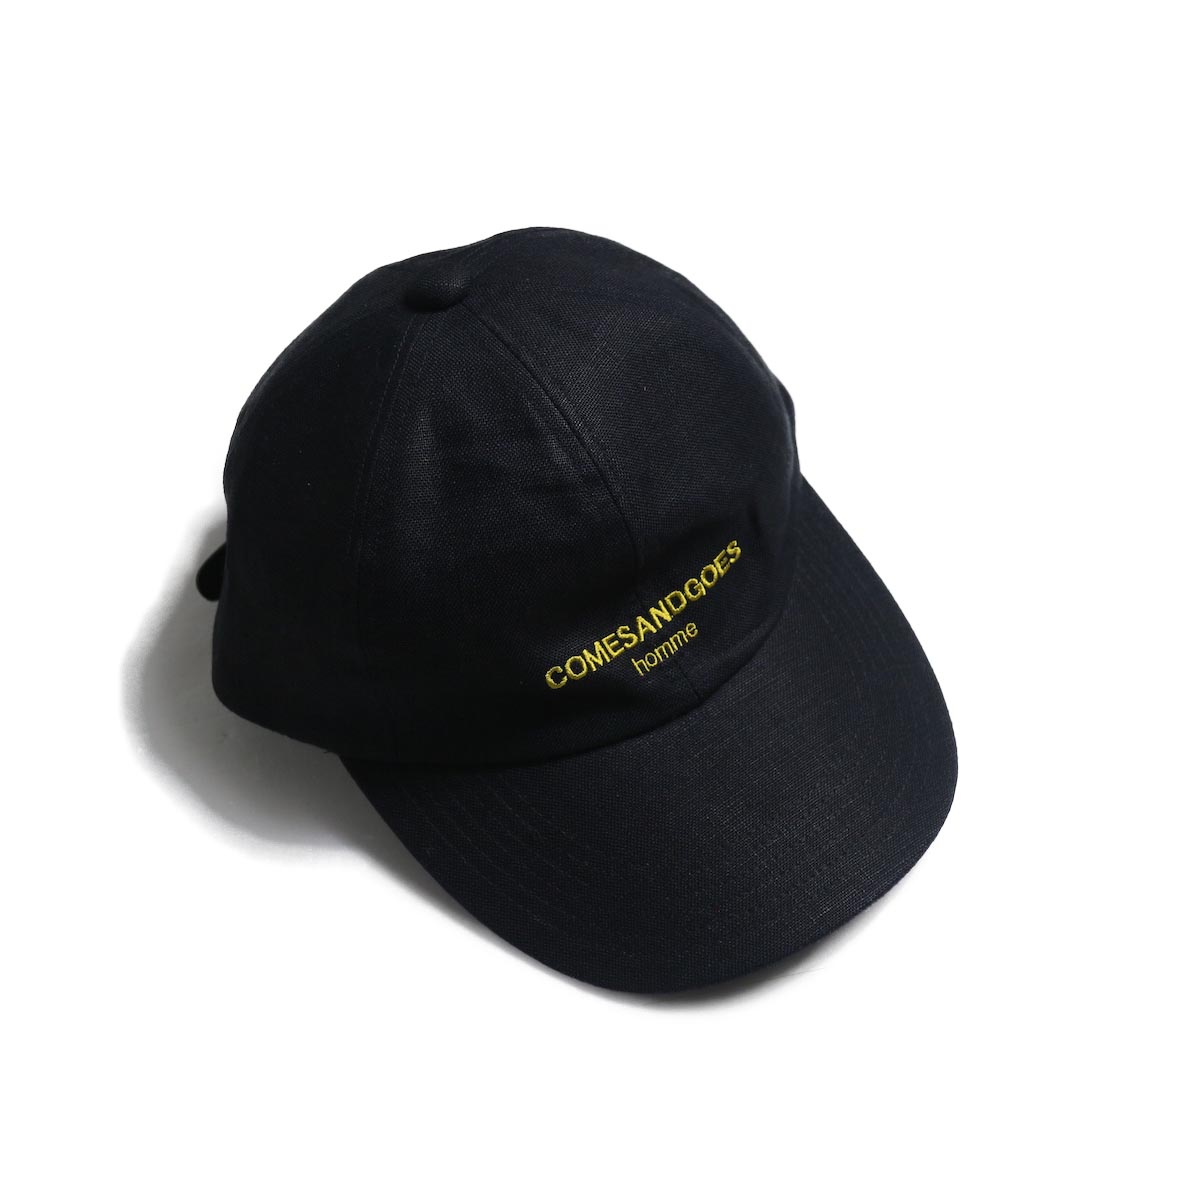 COMESANDGOES / COMES Homme Linen Cap (NO.14518) Navy